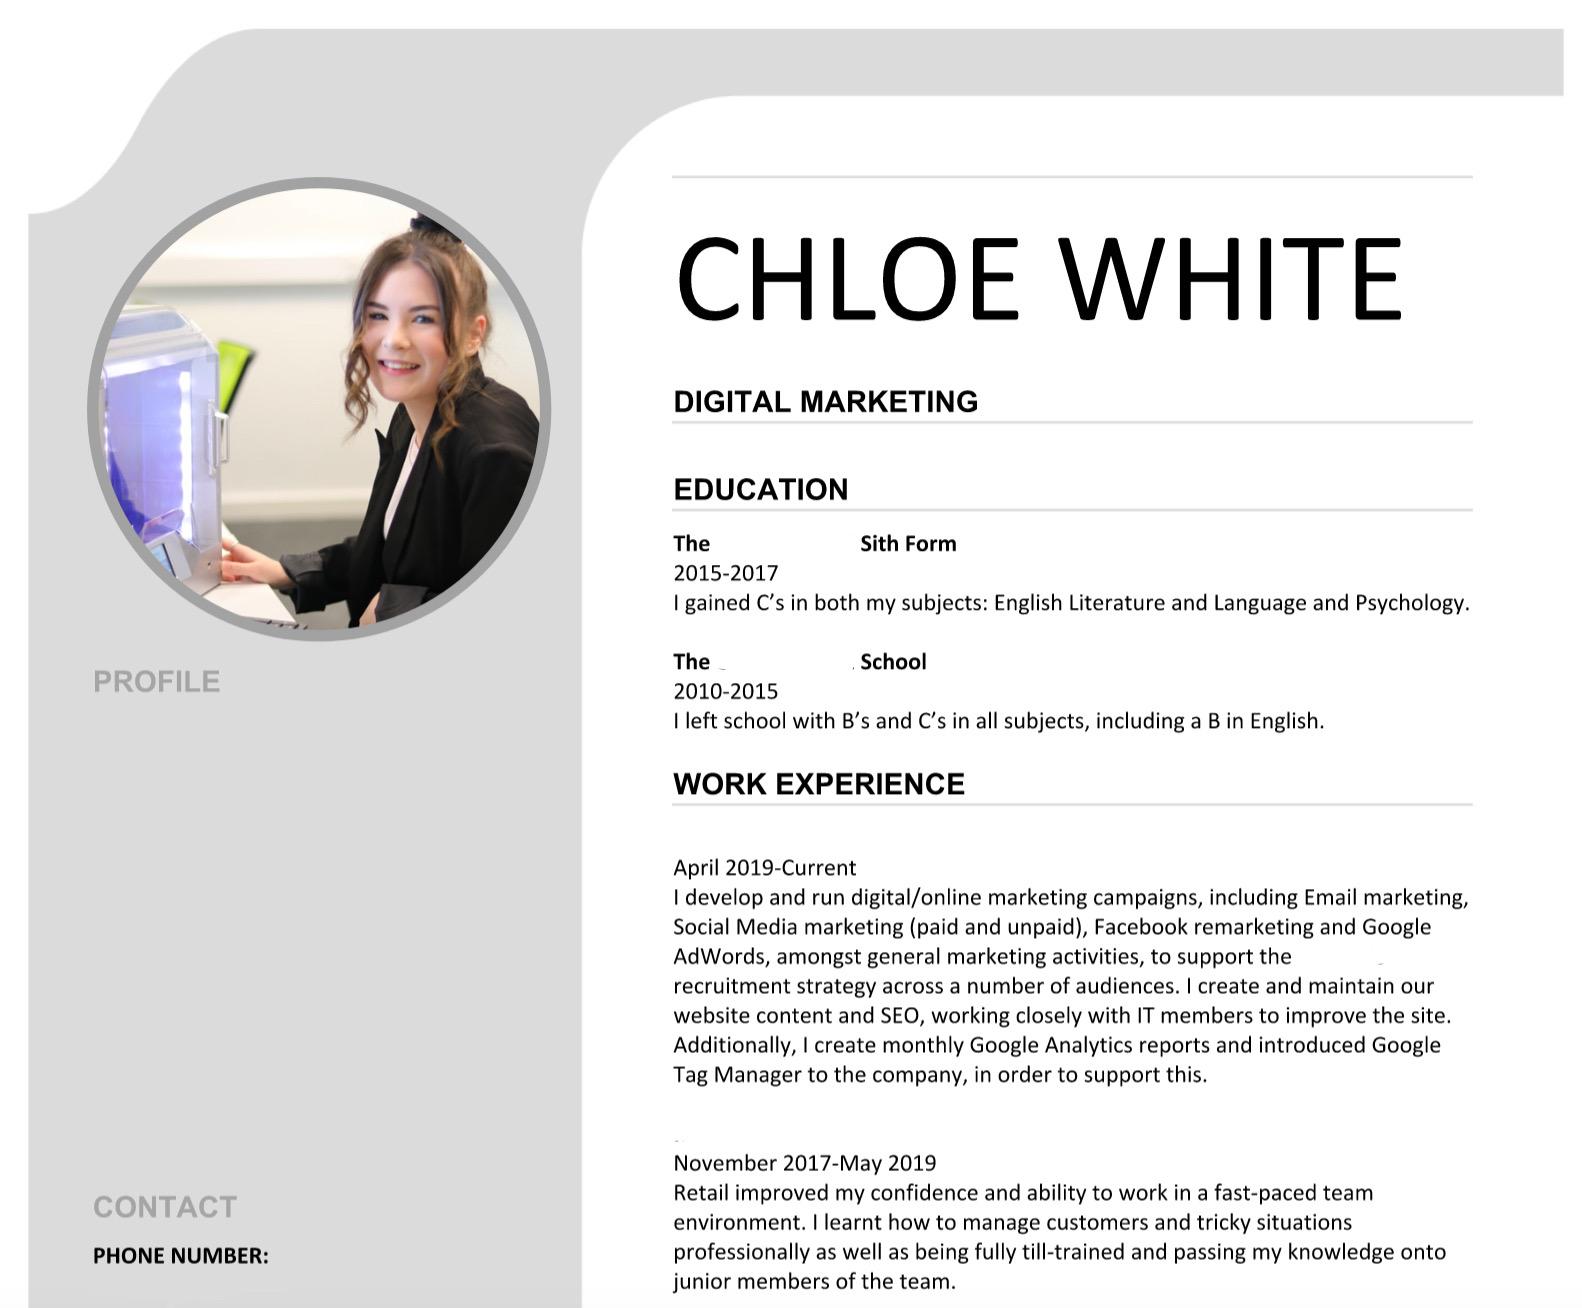 Screenshot of Chloe's Digital Marketing CV